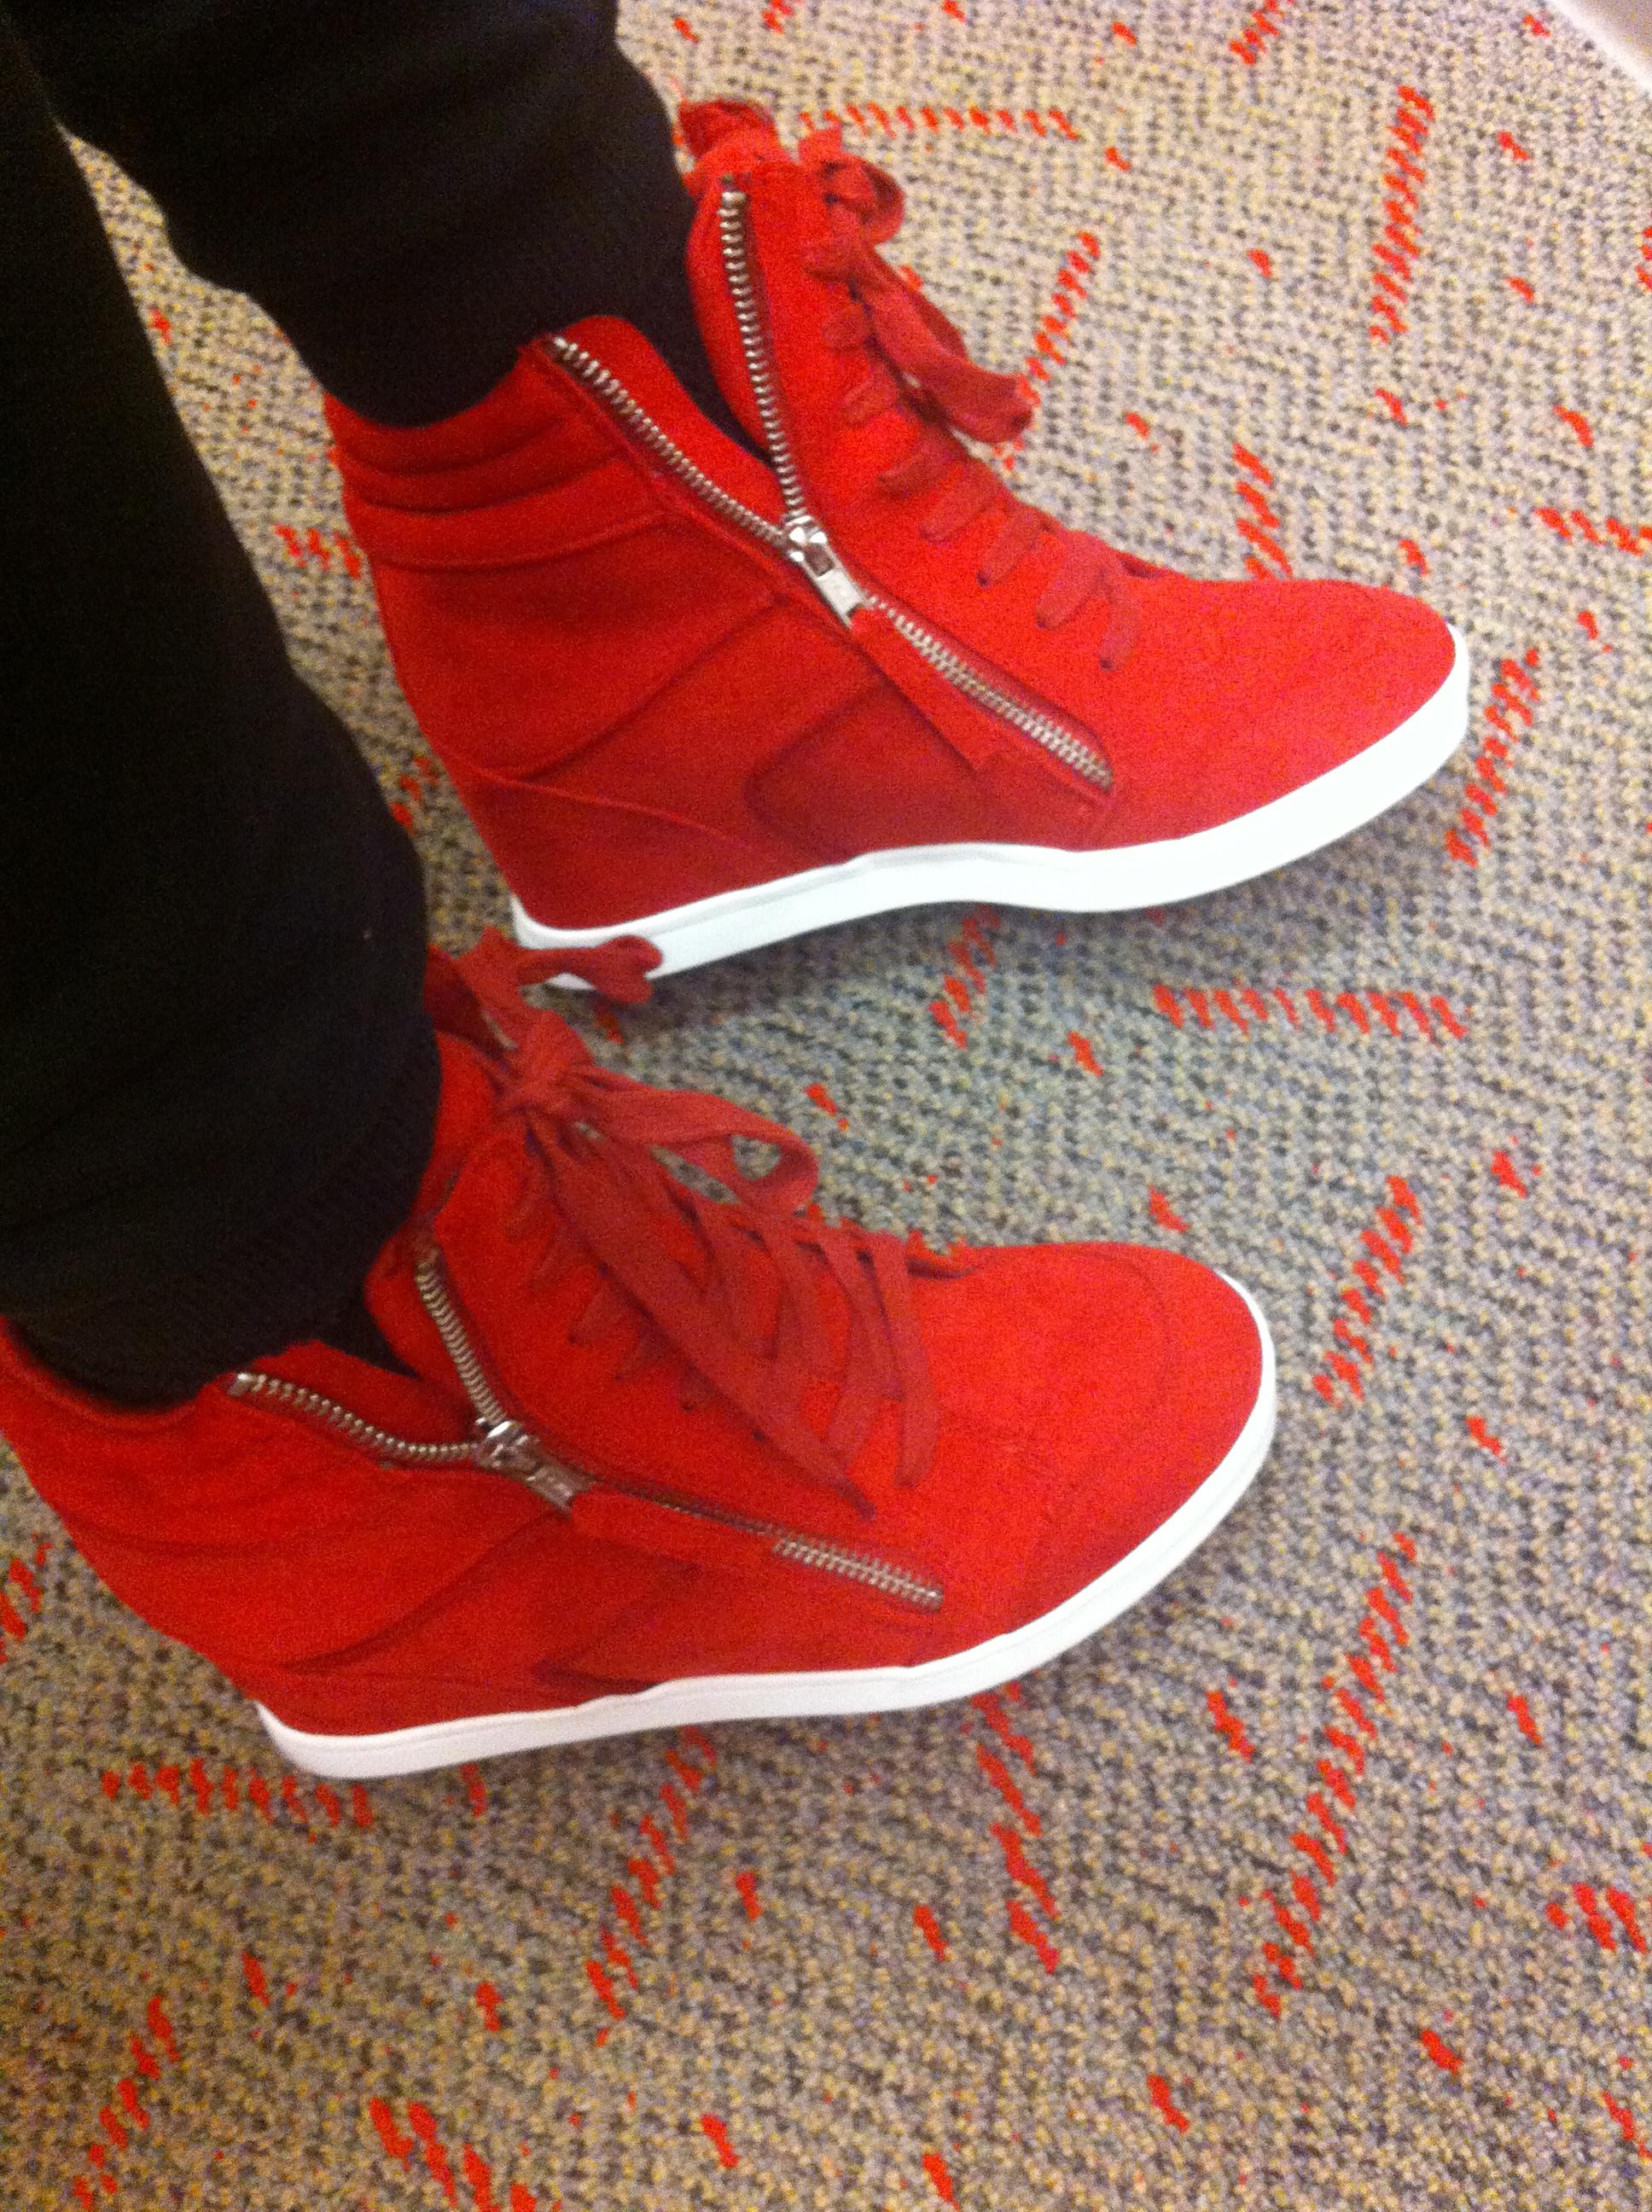 Rock & Republic Red Sneaker Wedges